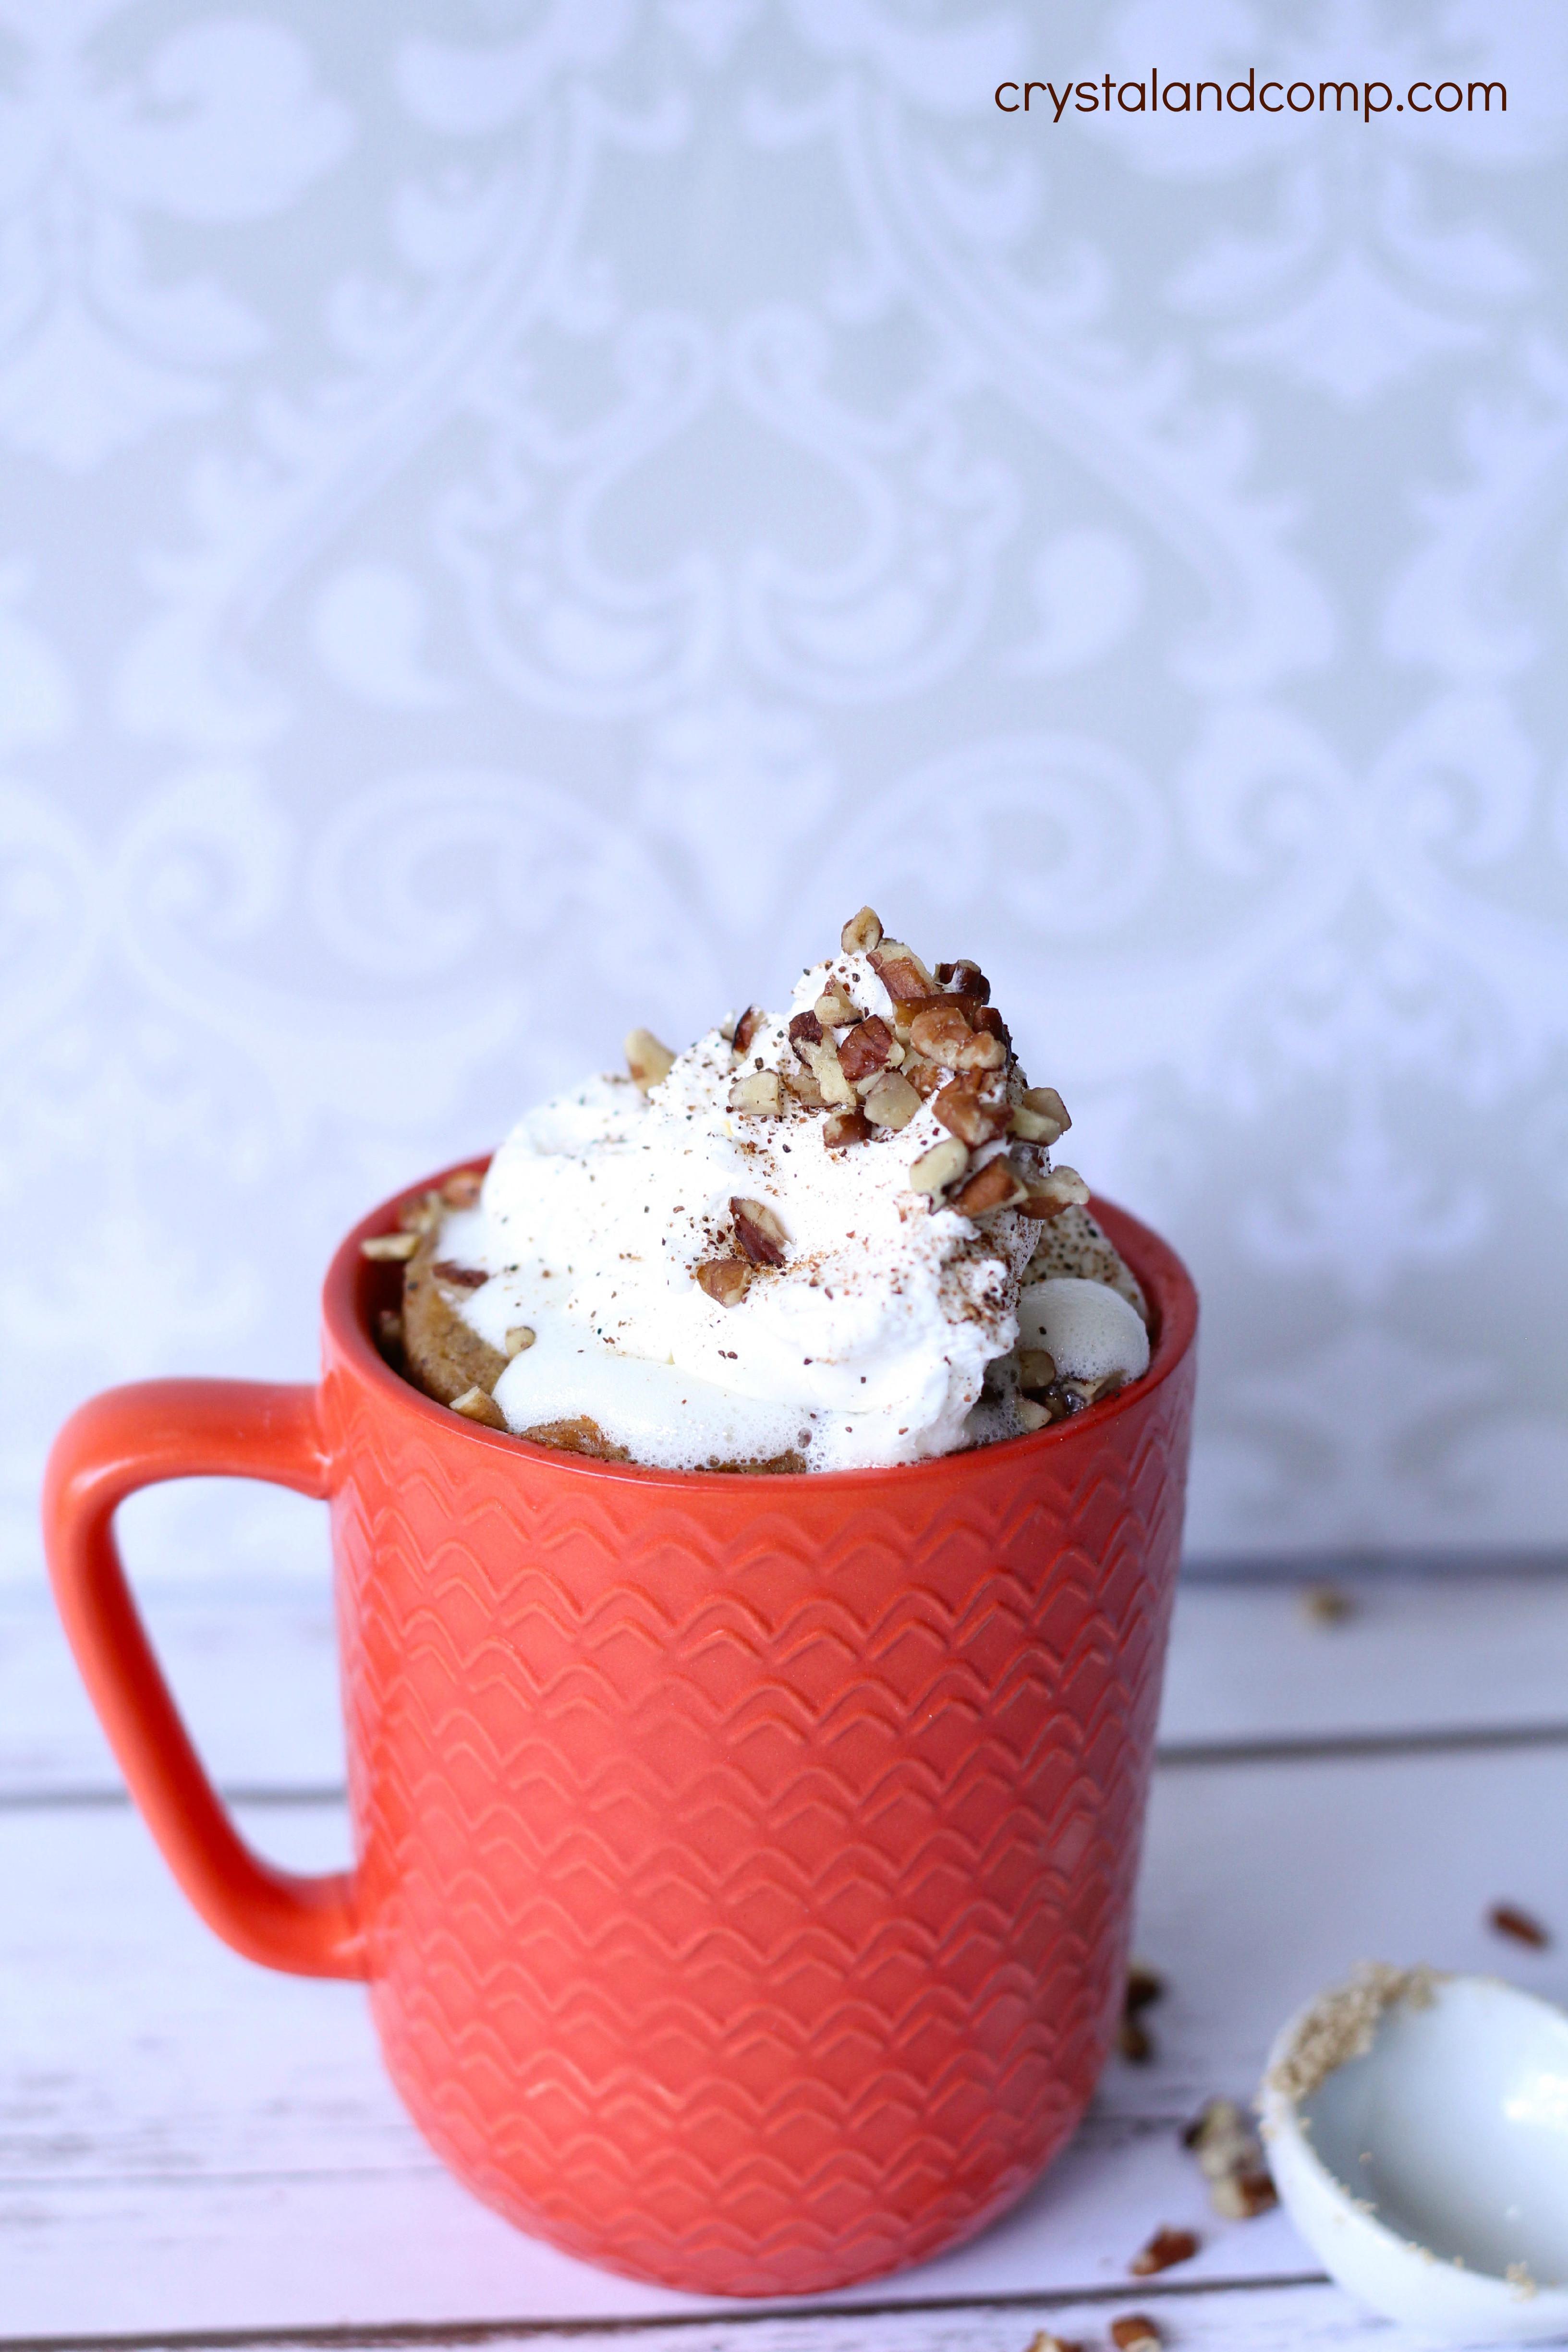 Microwave Mug Cake  Microwave Mug Cake Carrot Cake